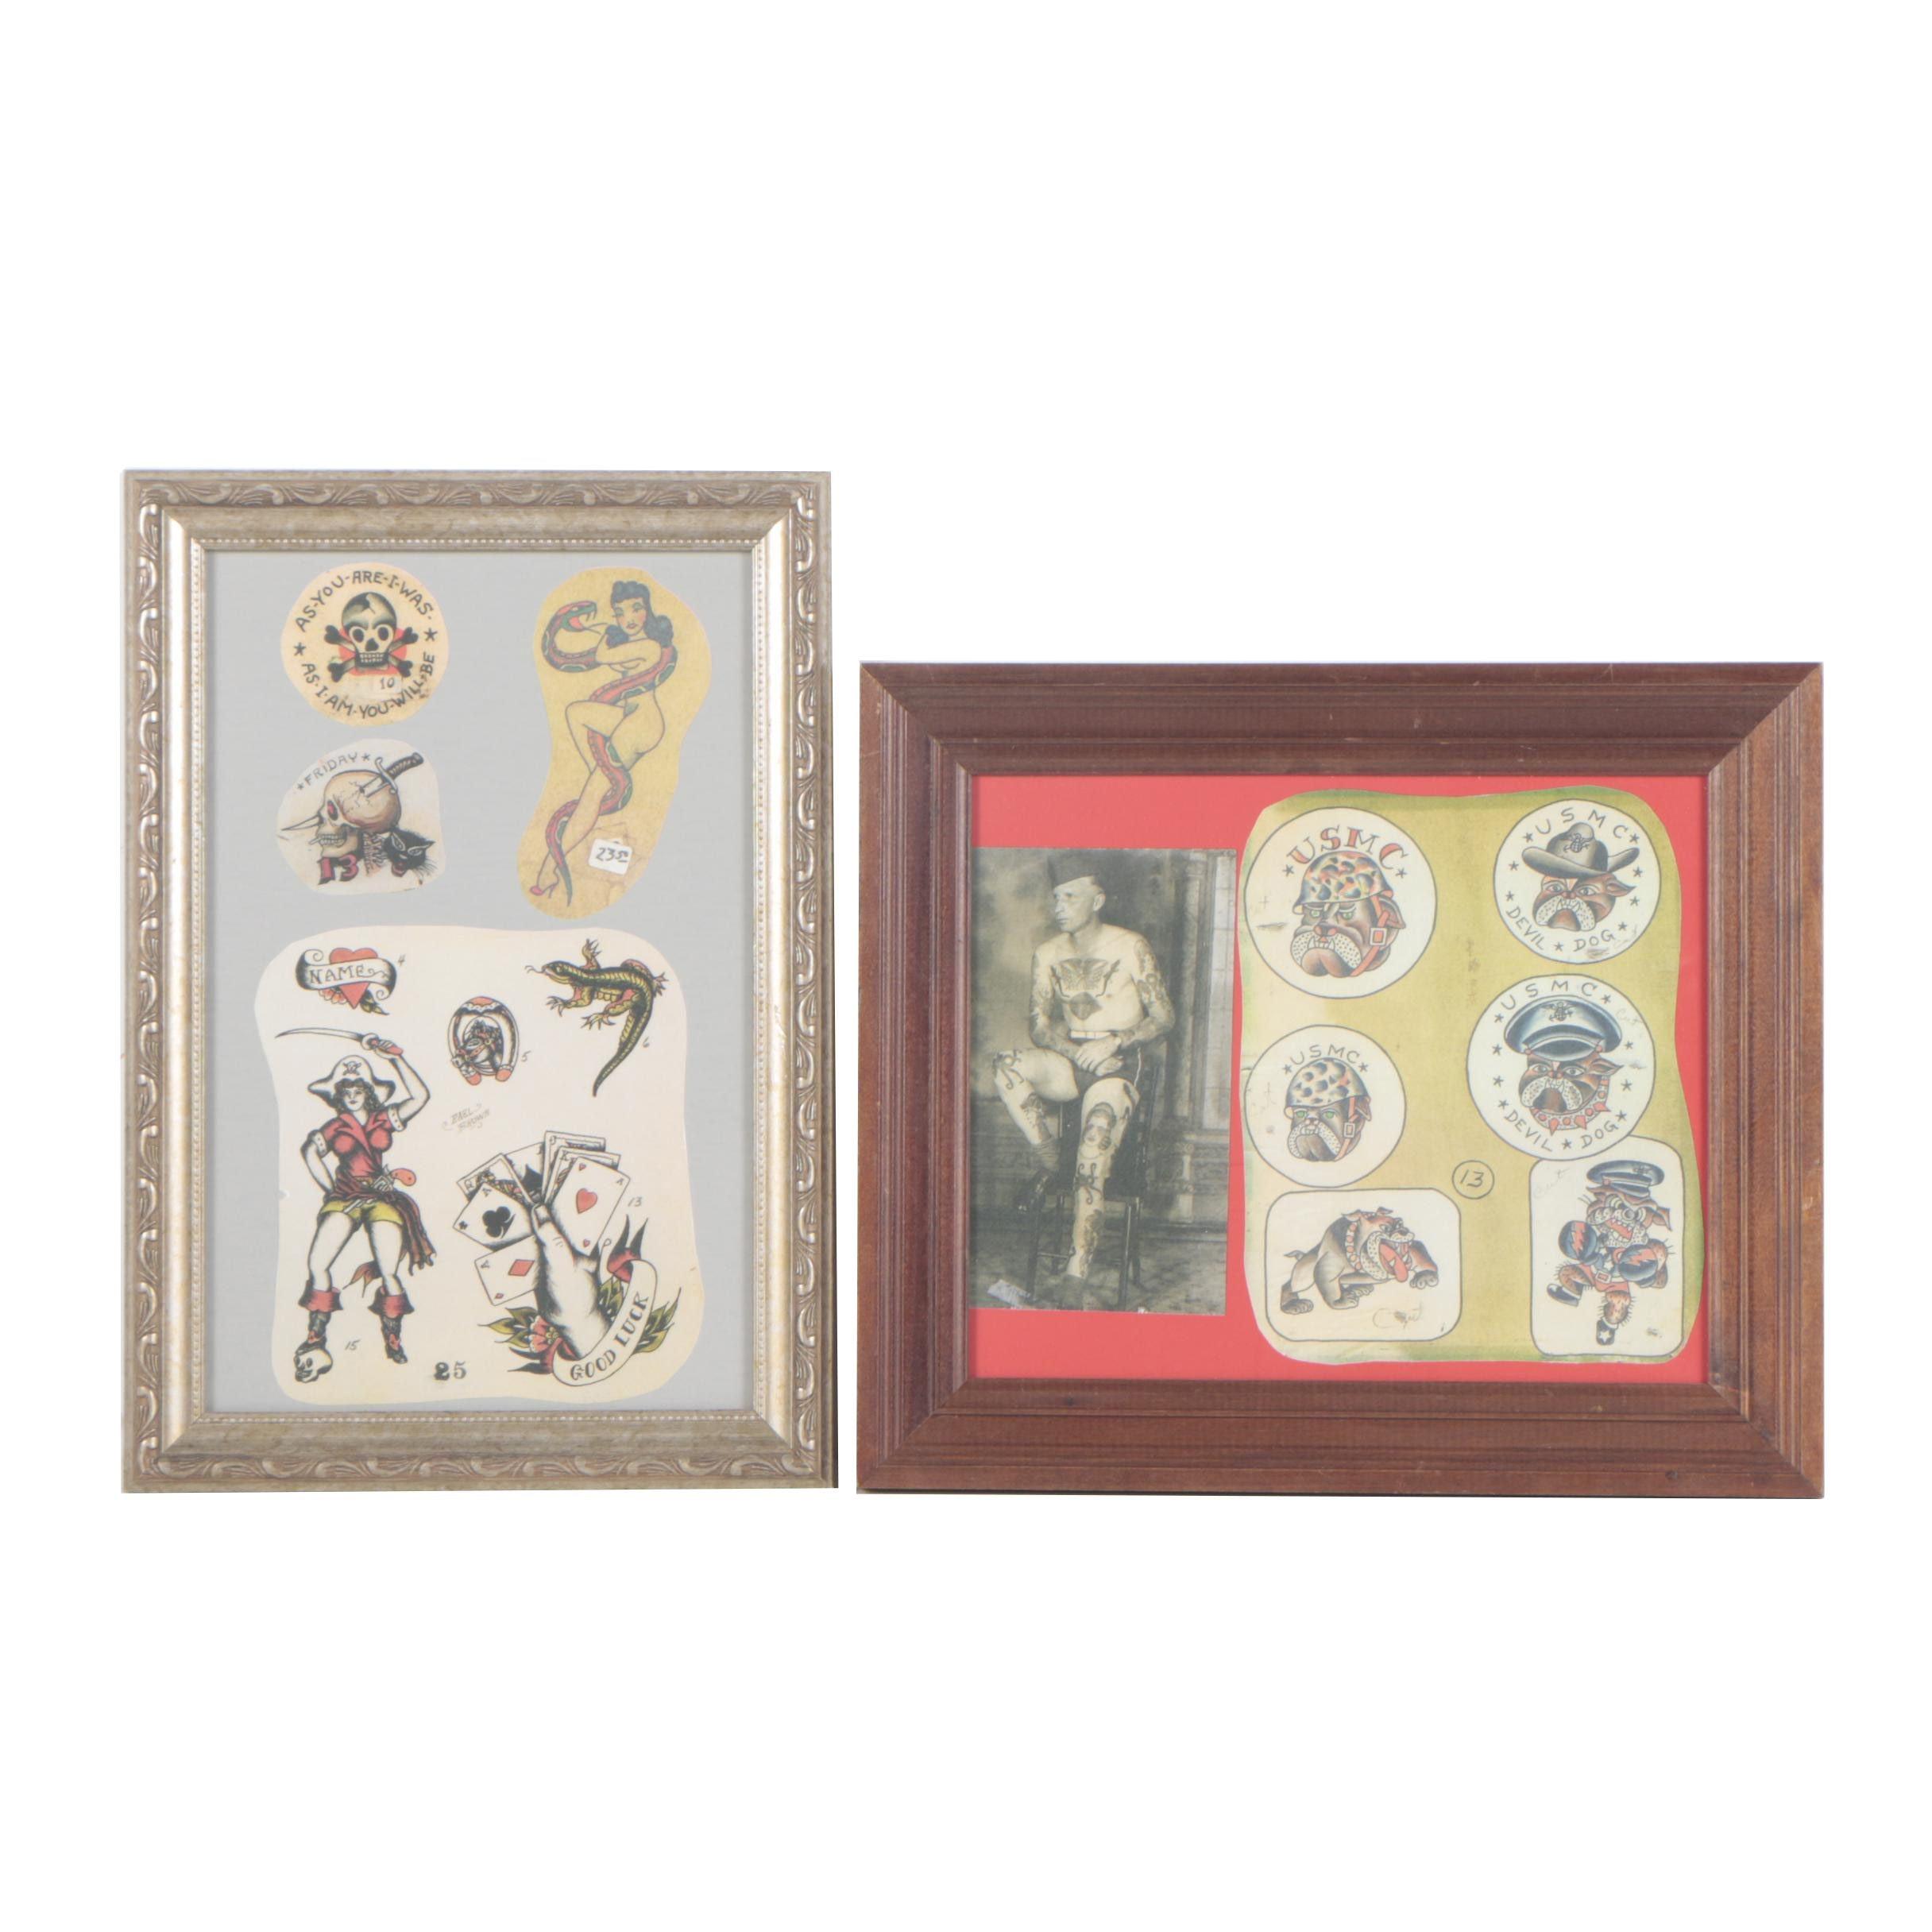 World War II Era Reproduction Tattoo Patterns and Photograph